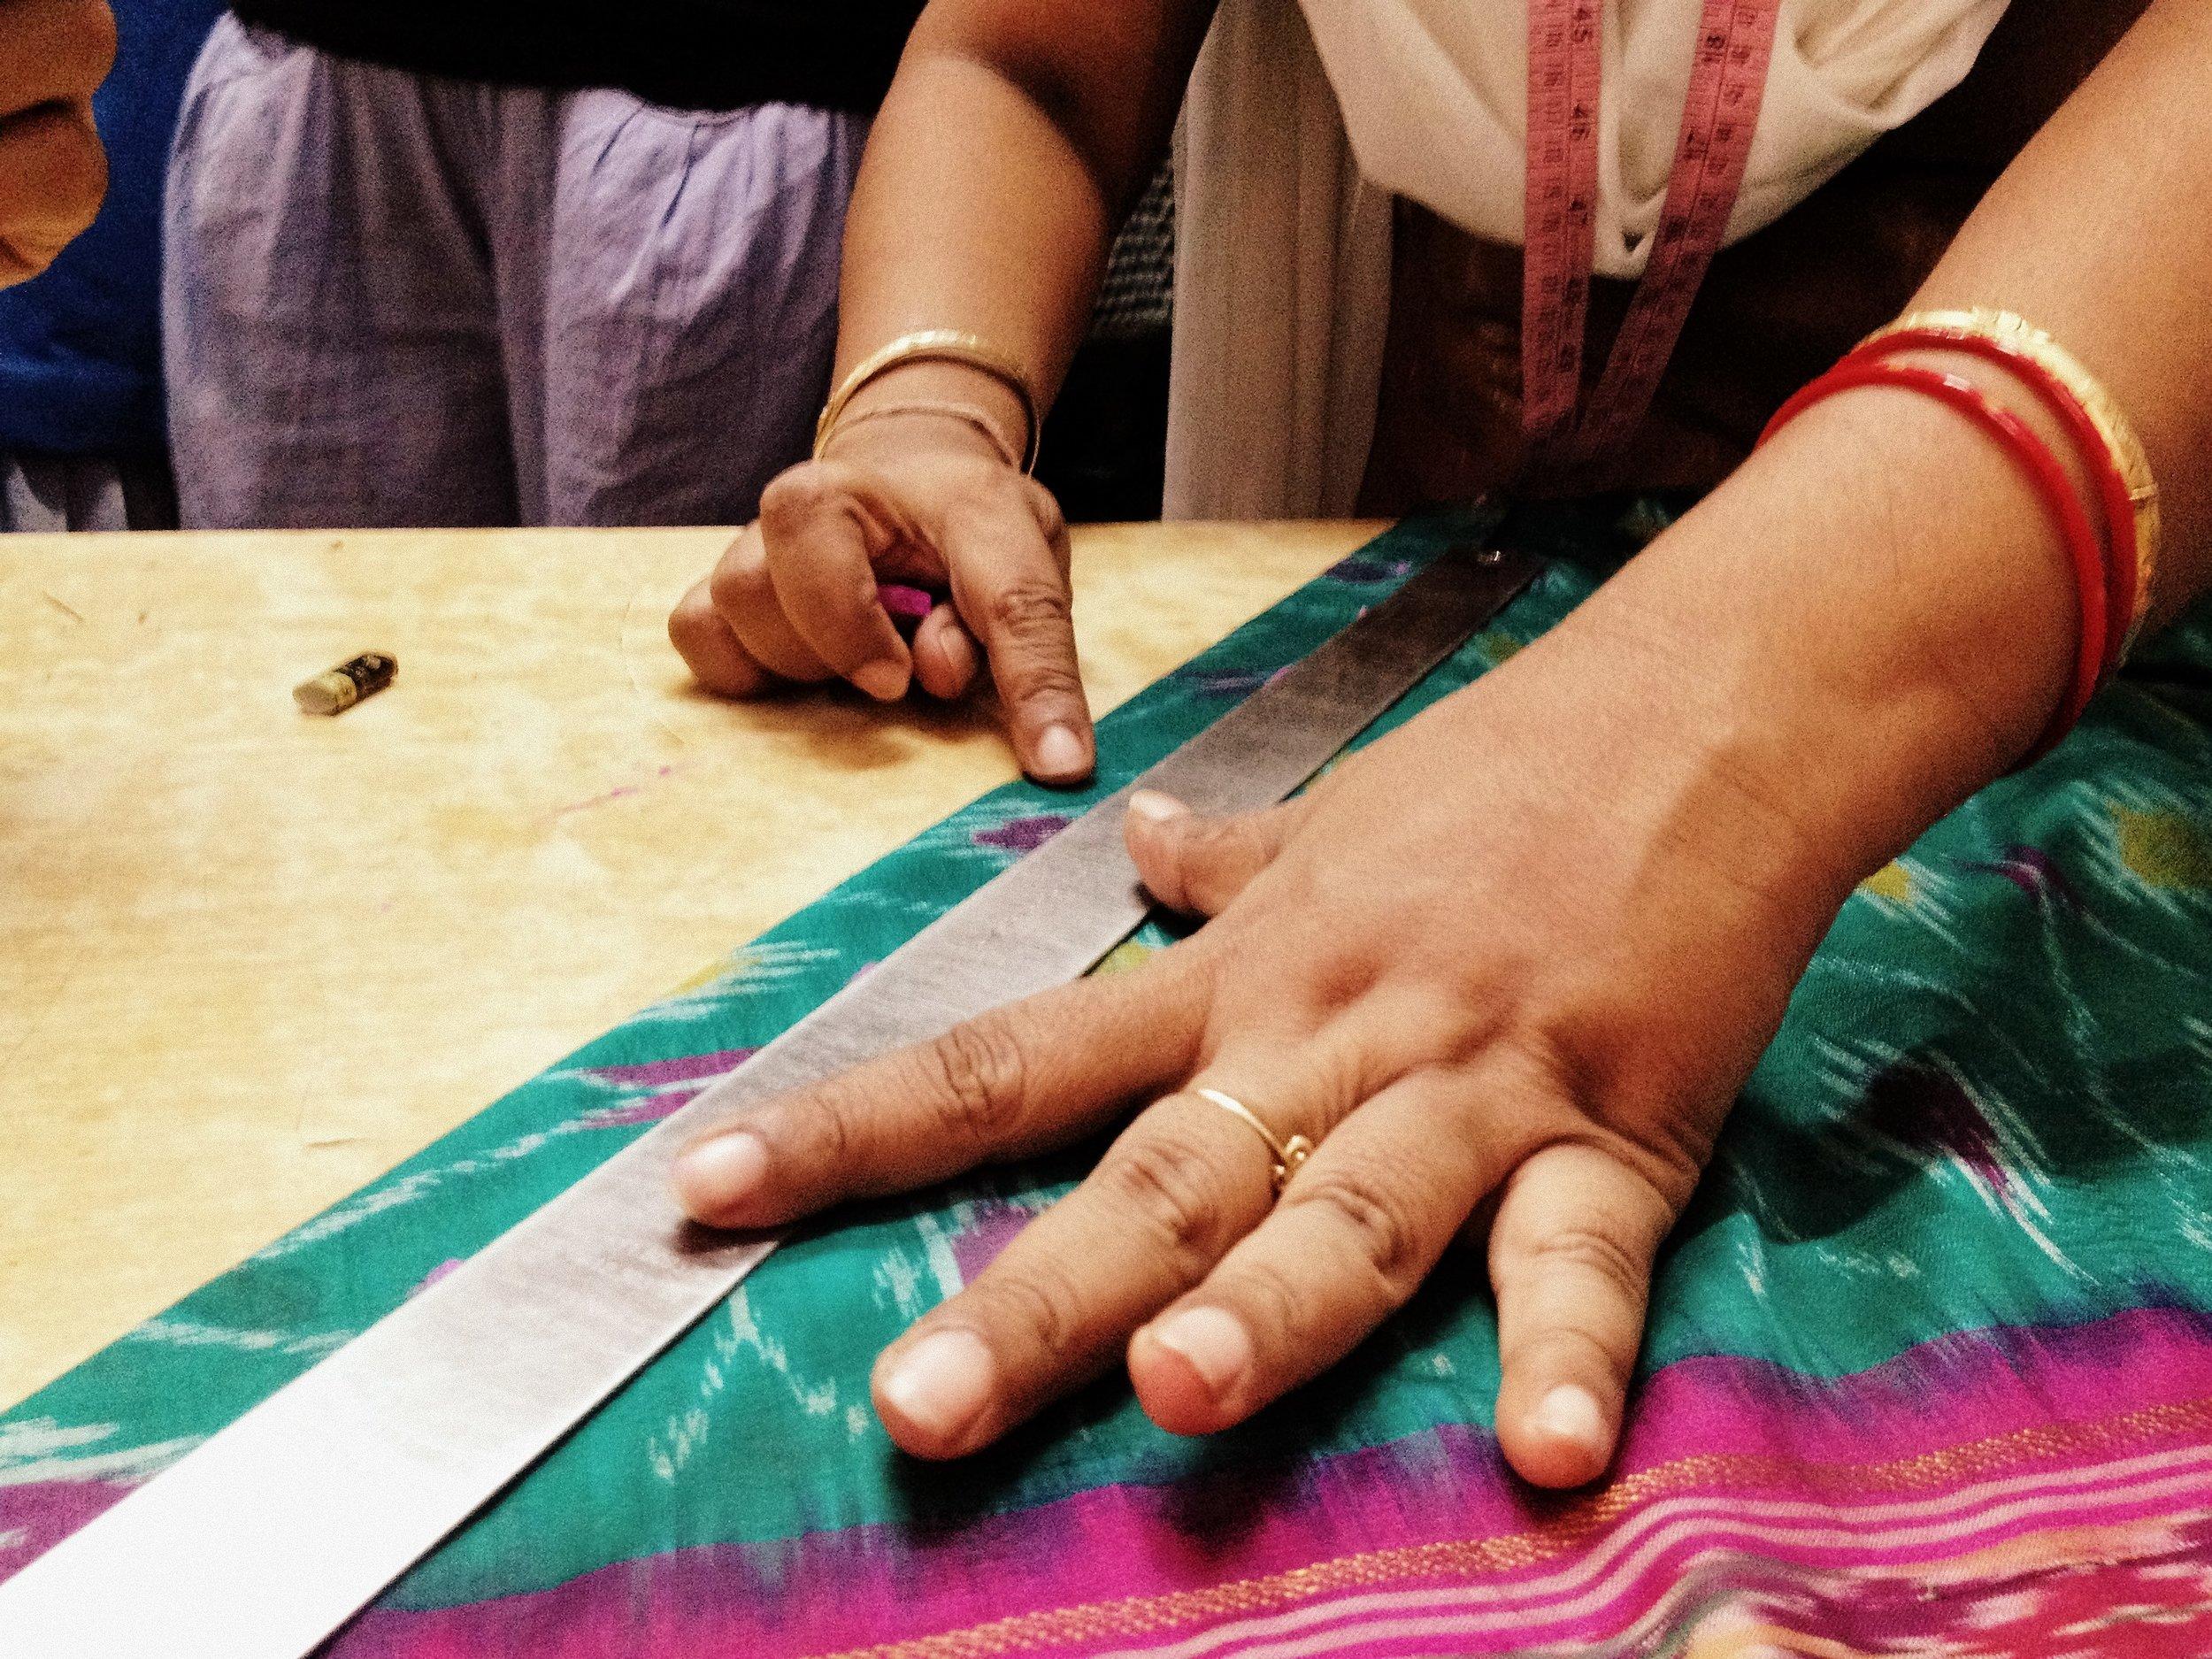 Sari being cut to size to make sari necklaces